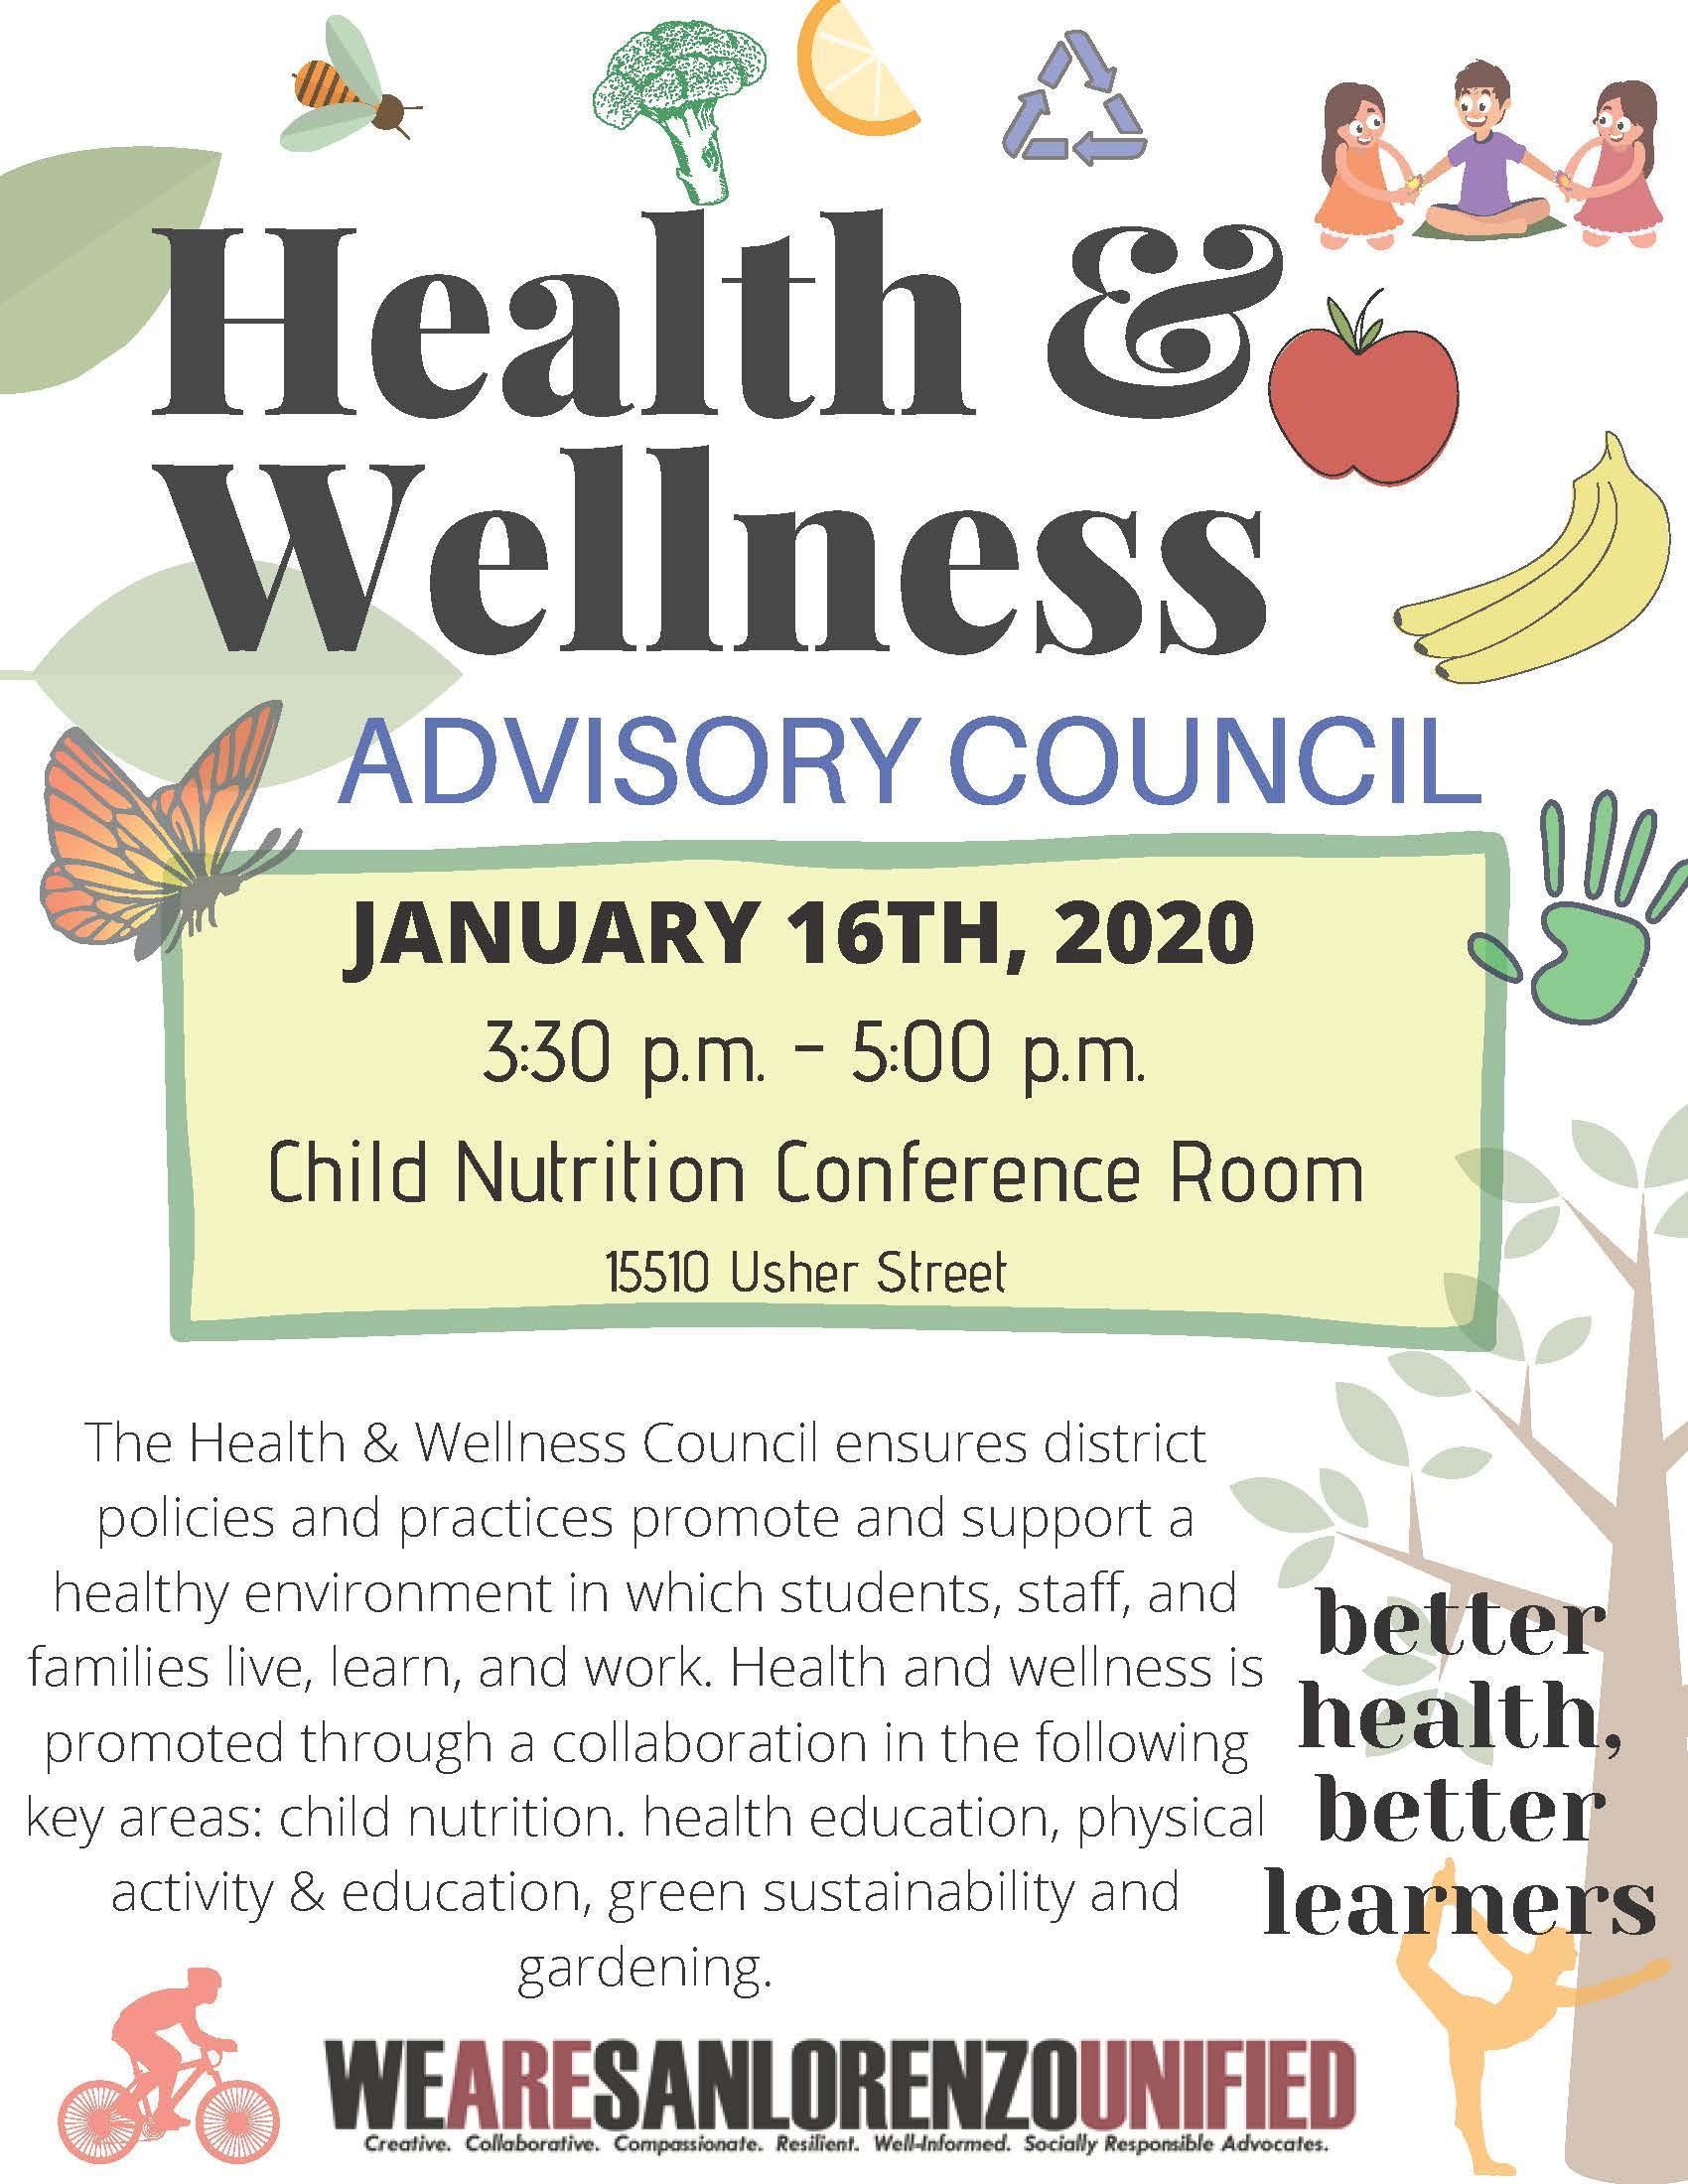 Health and Wellness Advisory Council